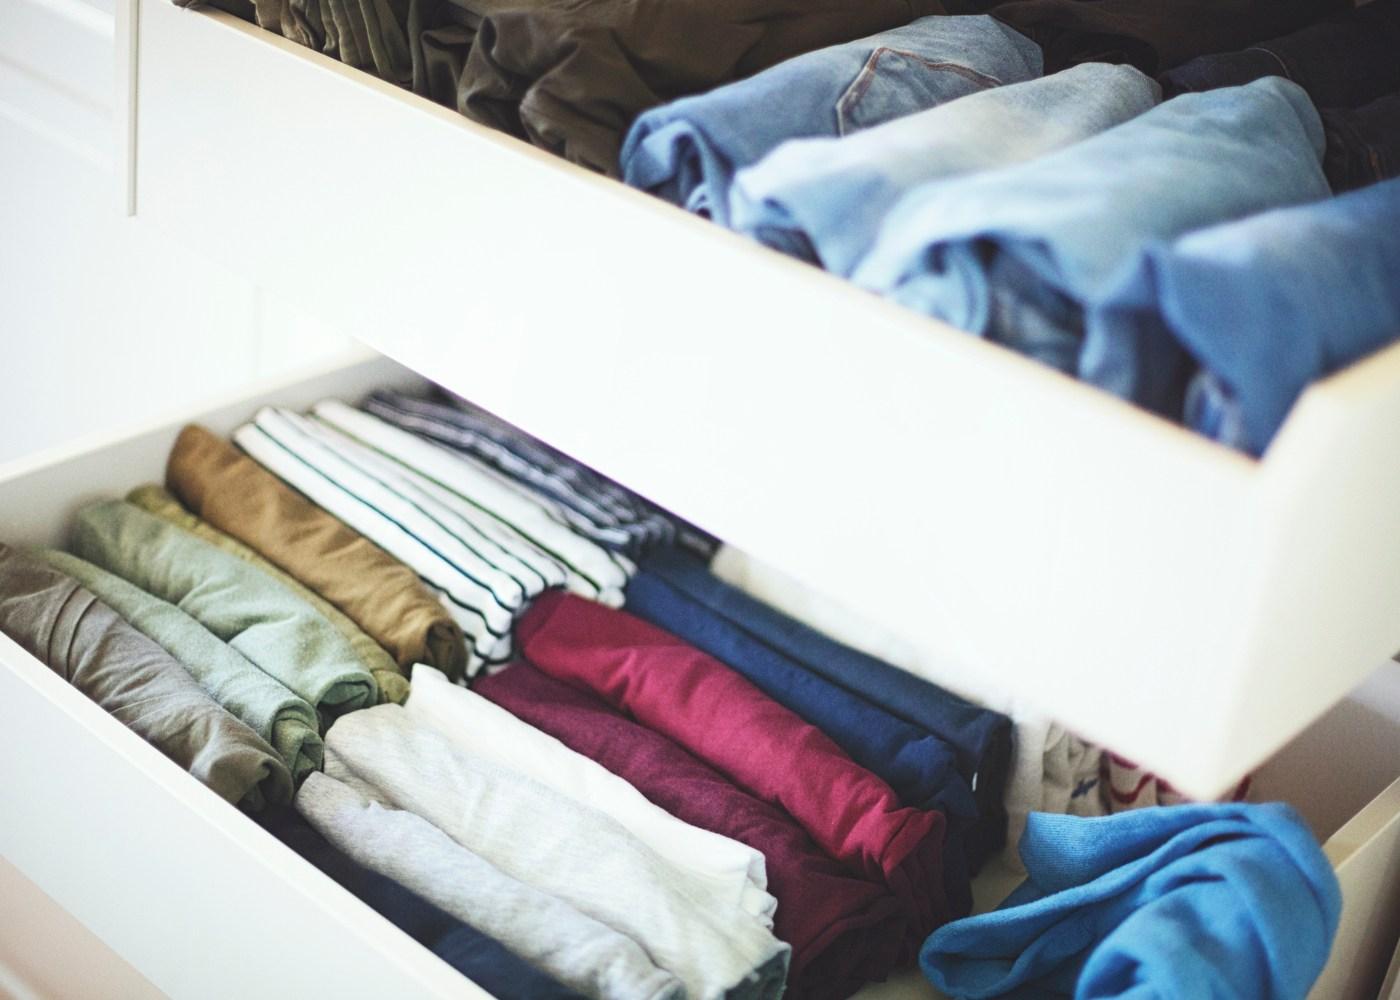 gavetas de roupa organizada